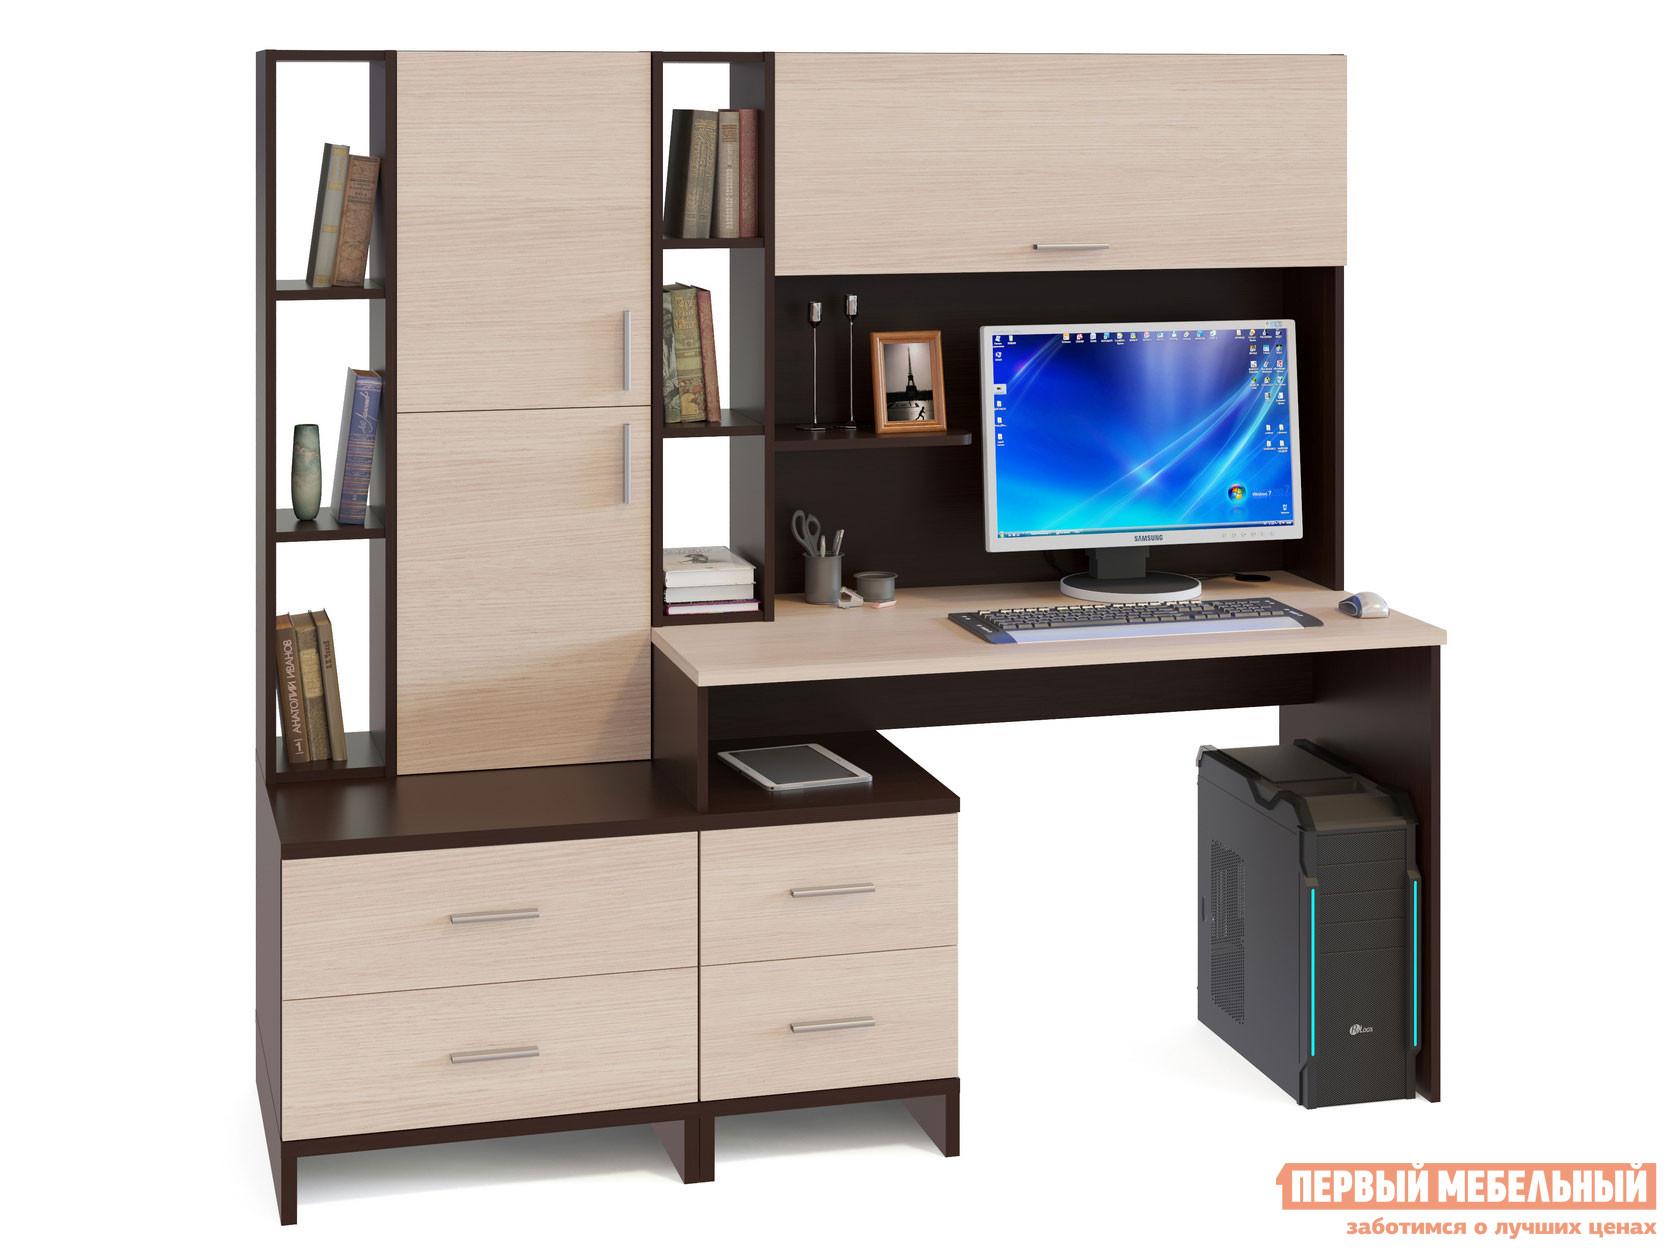 Компьютерный стол со стеллажом Сокол КСТ-114+КН-03+СТ-10